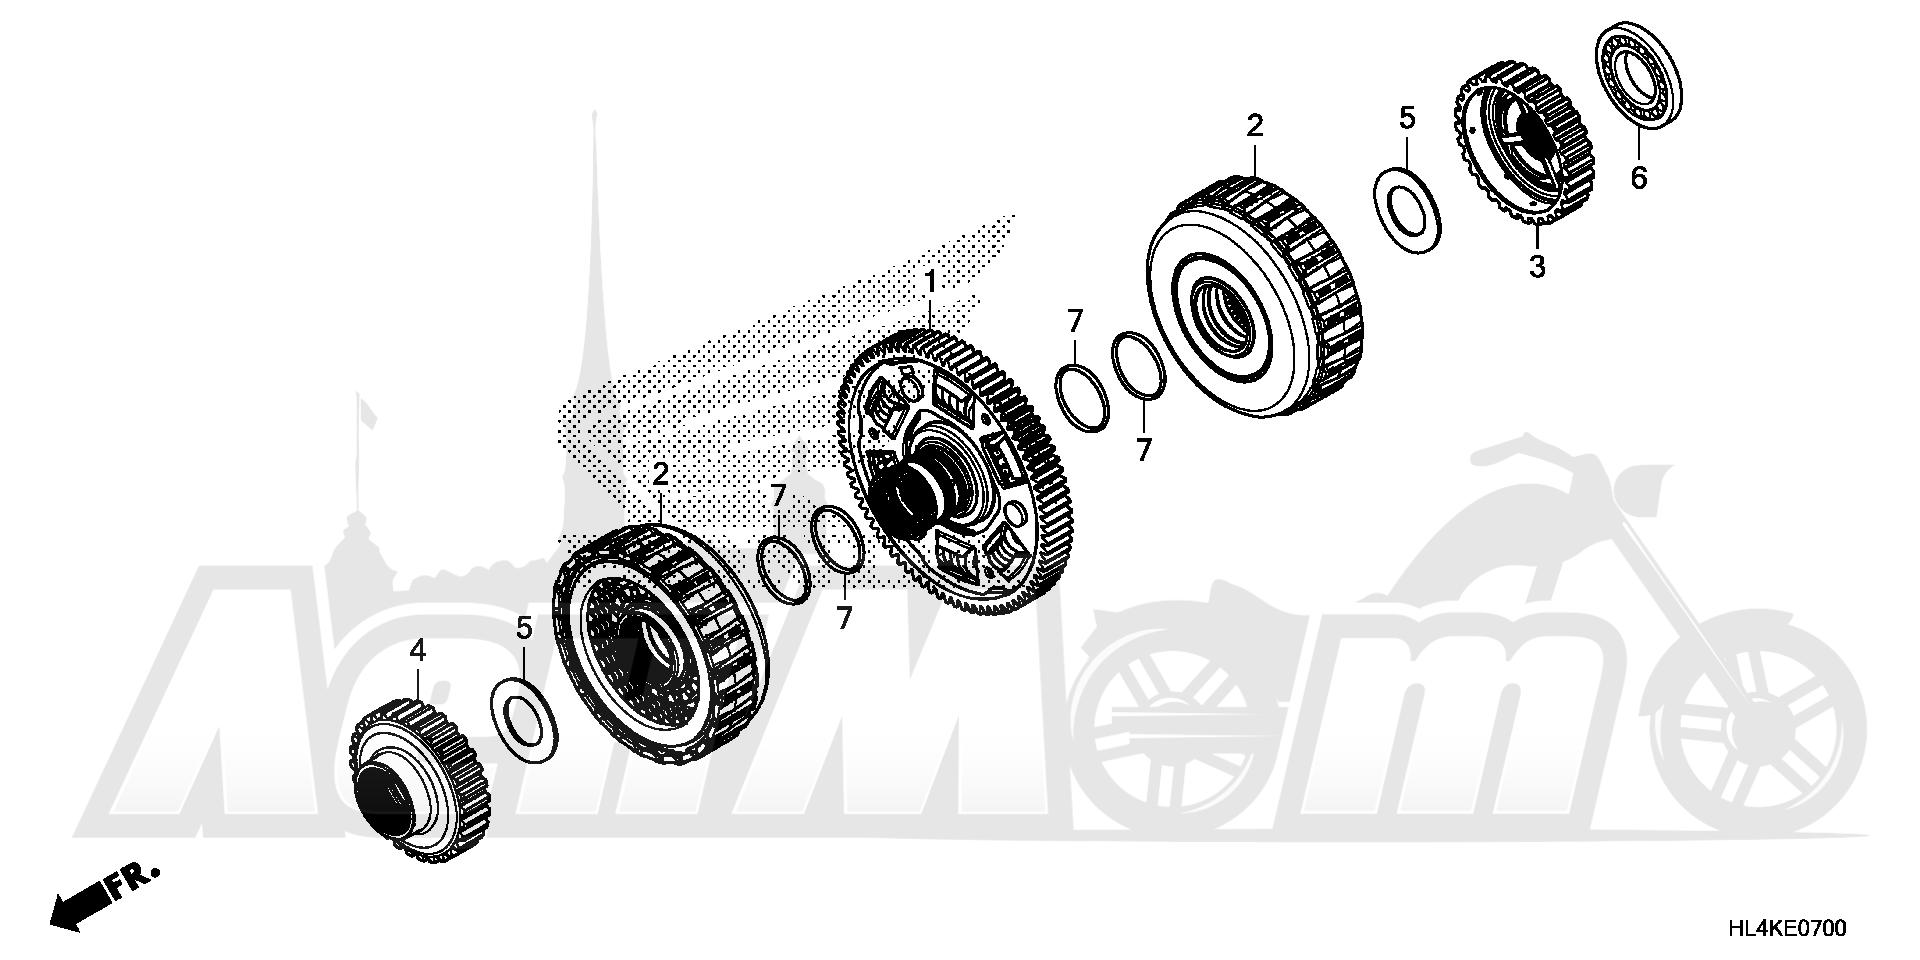 Запчасти для Квадроцикла Honda 2019 SXS1000M3P Раздел: CLUTCH | сцепление